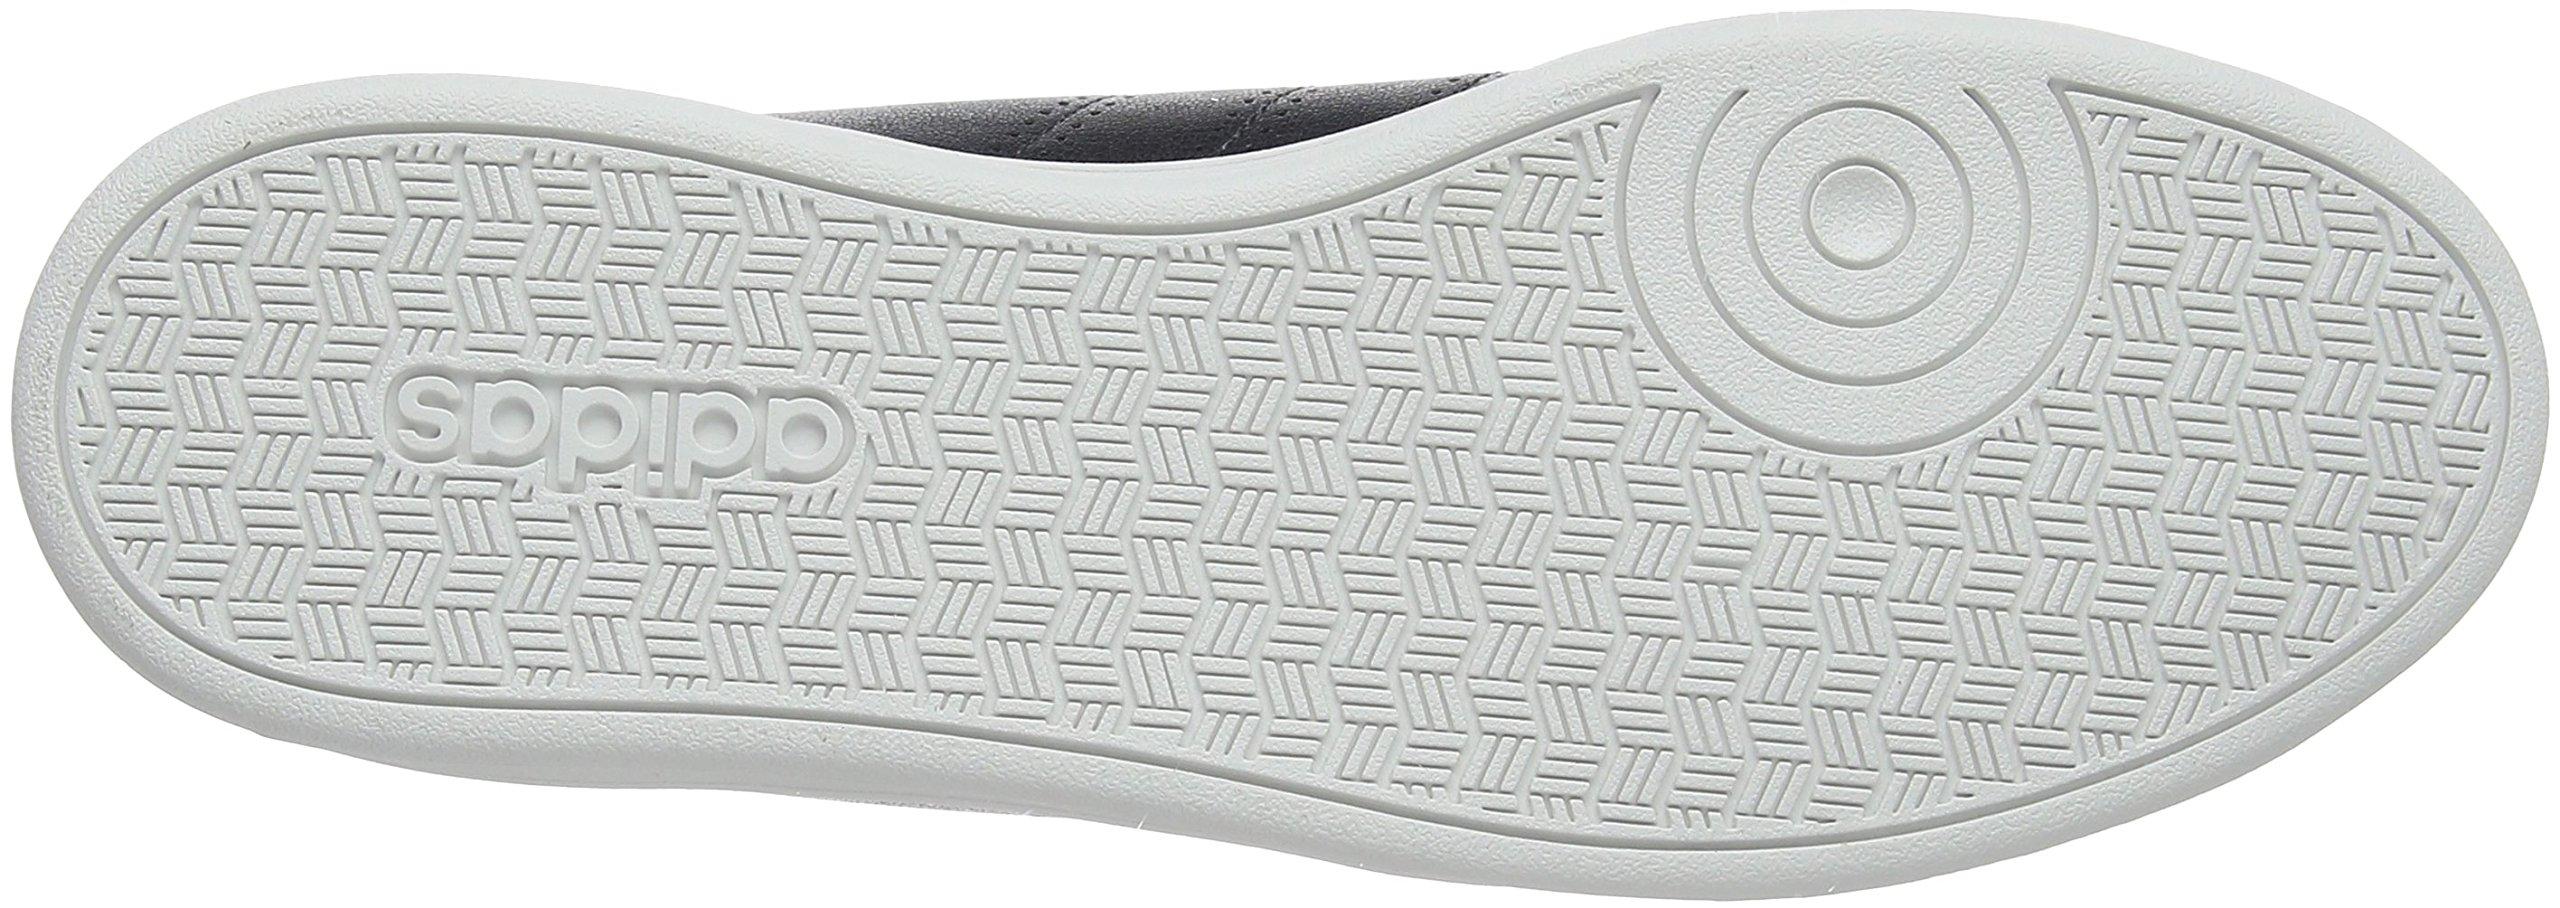 adidas Advantage Cl QT, Scarpe da Tennis Donna 3 spesavip